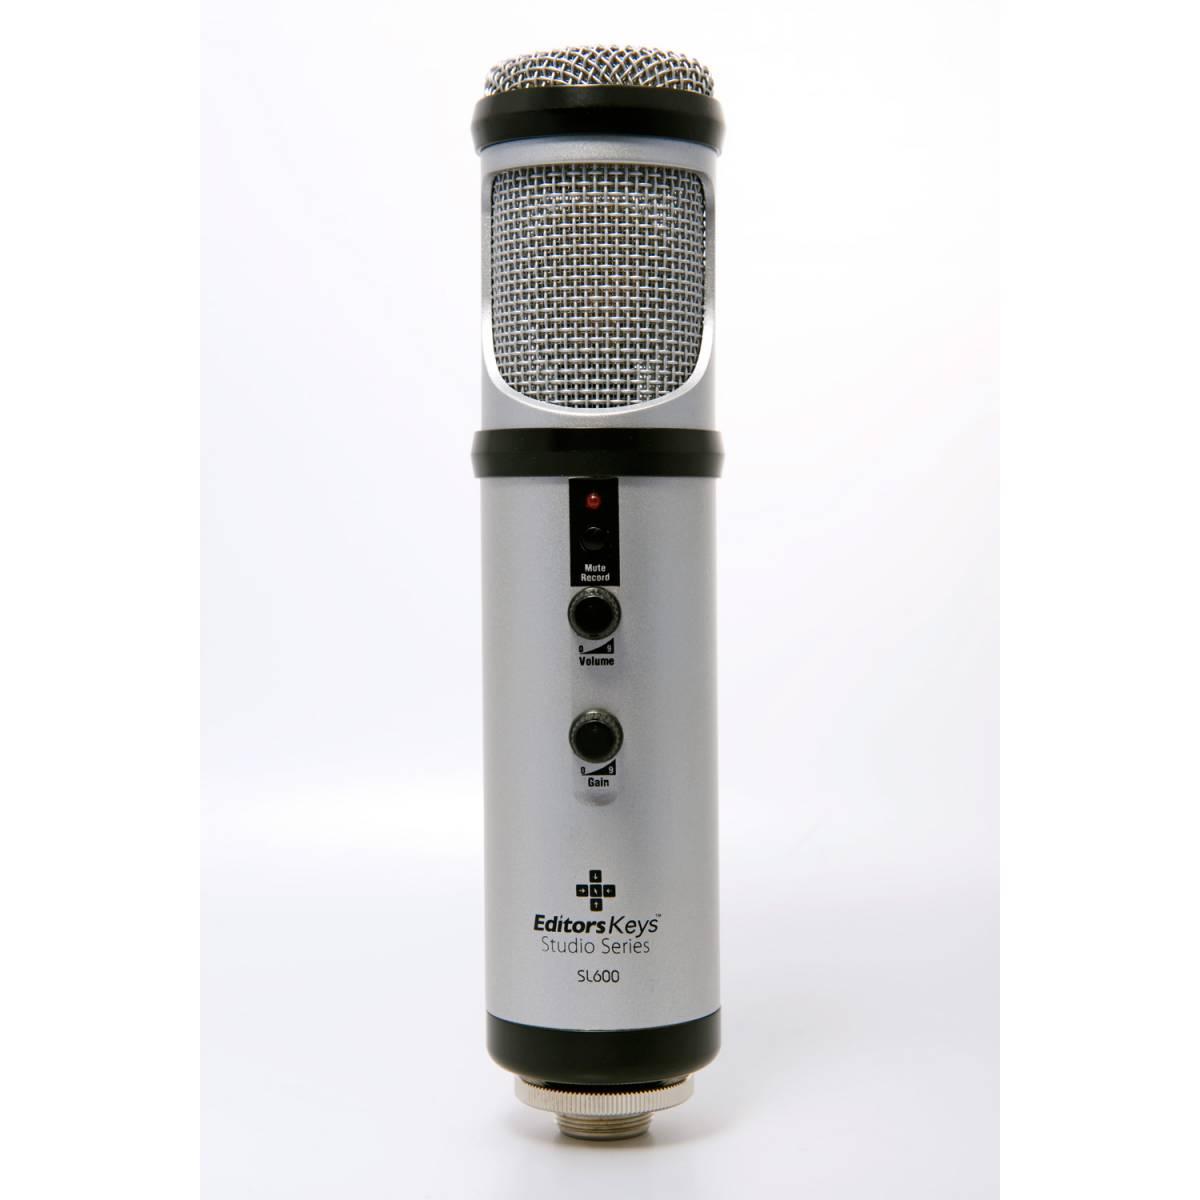 editors keys sl600 usb studio mic and shockmount. Black Bedroom Furniture Sets. Home Design Ideas